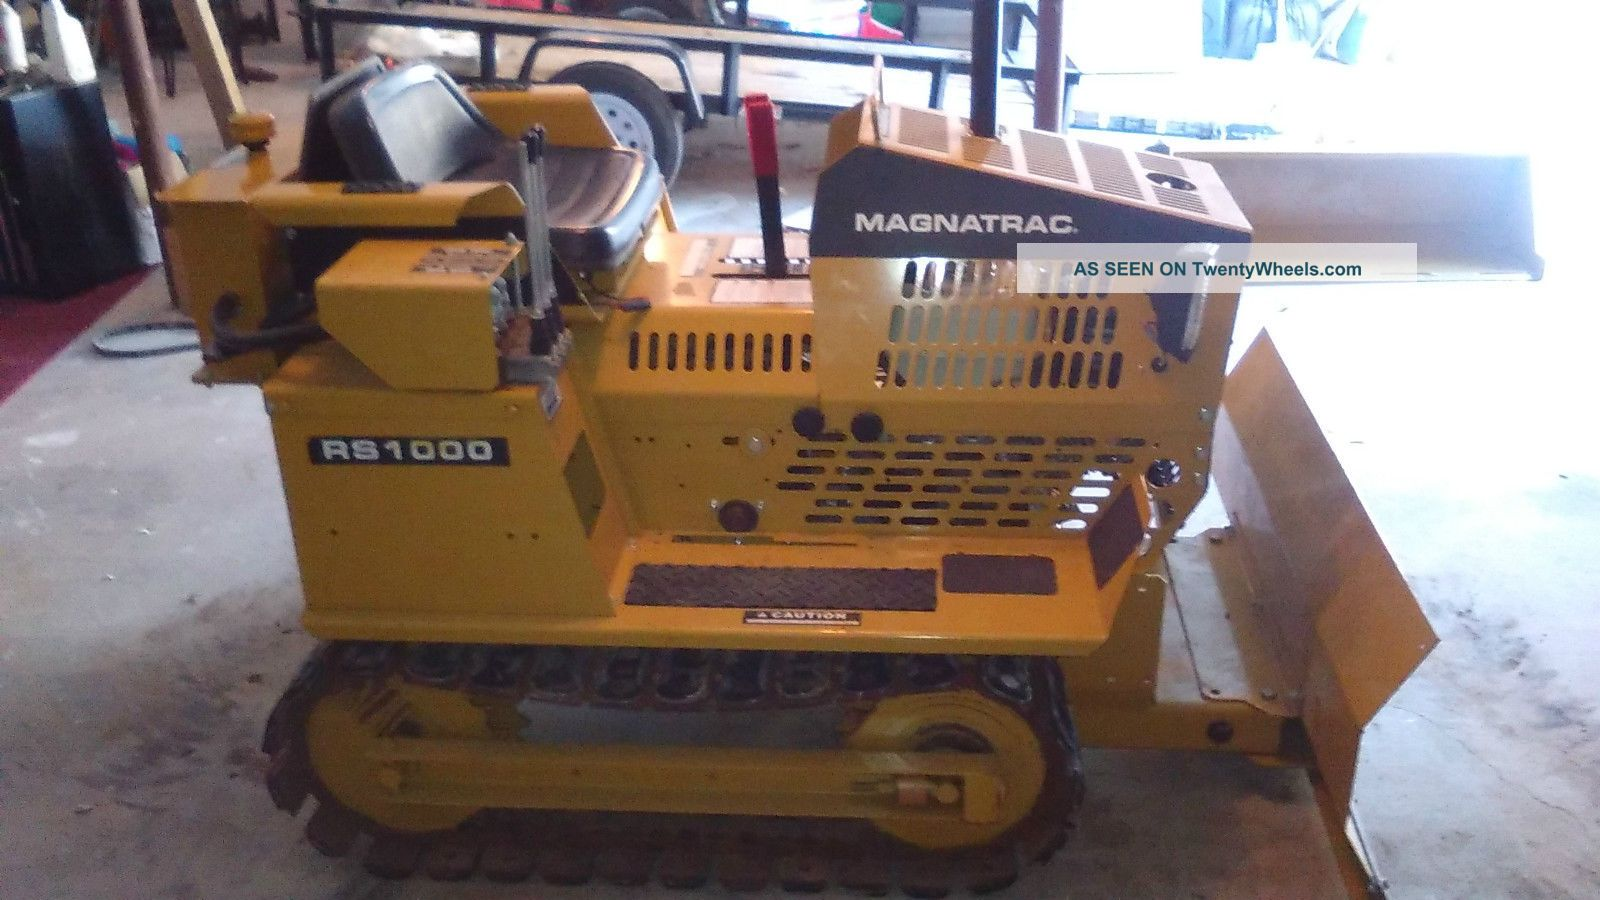 Dozer Struck Magnatrac Rs1000